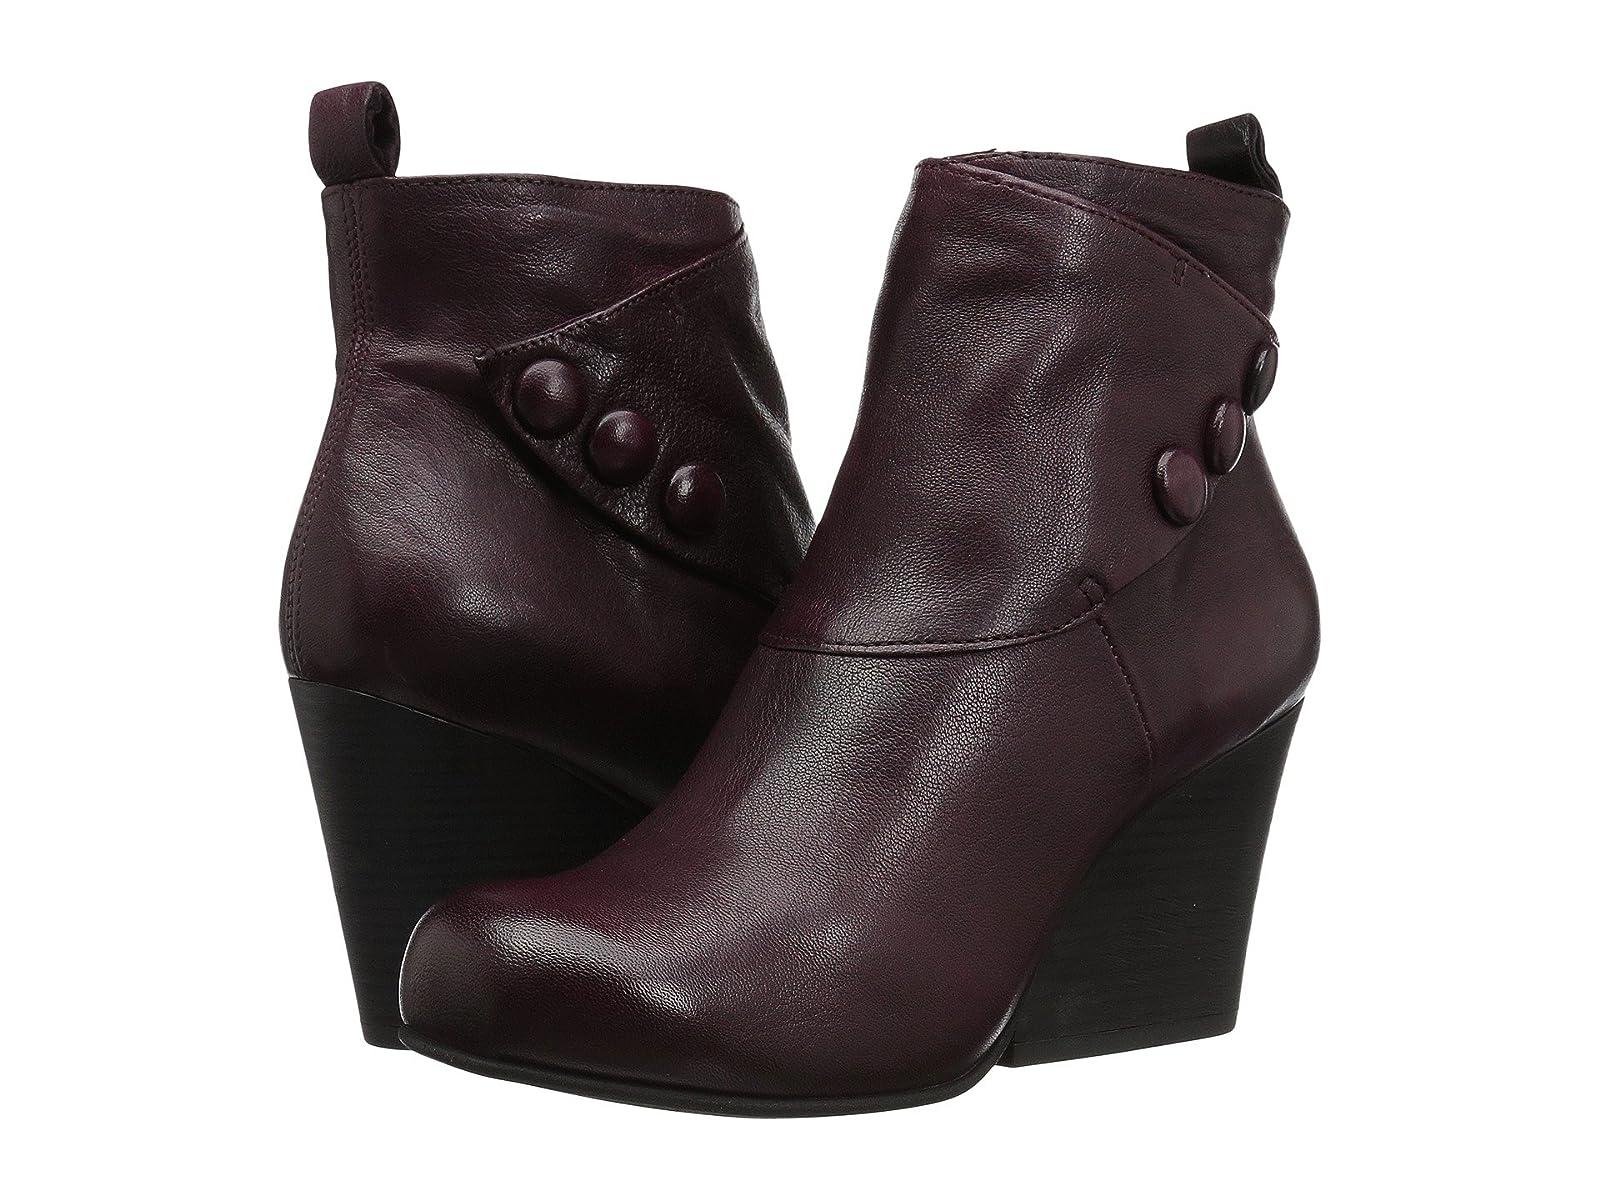 Miz Mooz KeeganCheap and distinctive eye-catching shoes